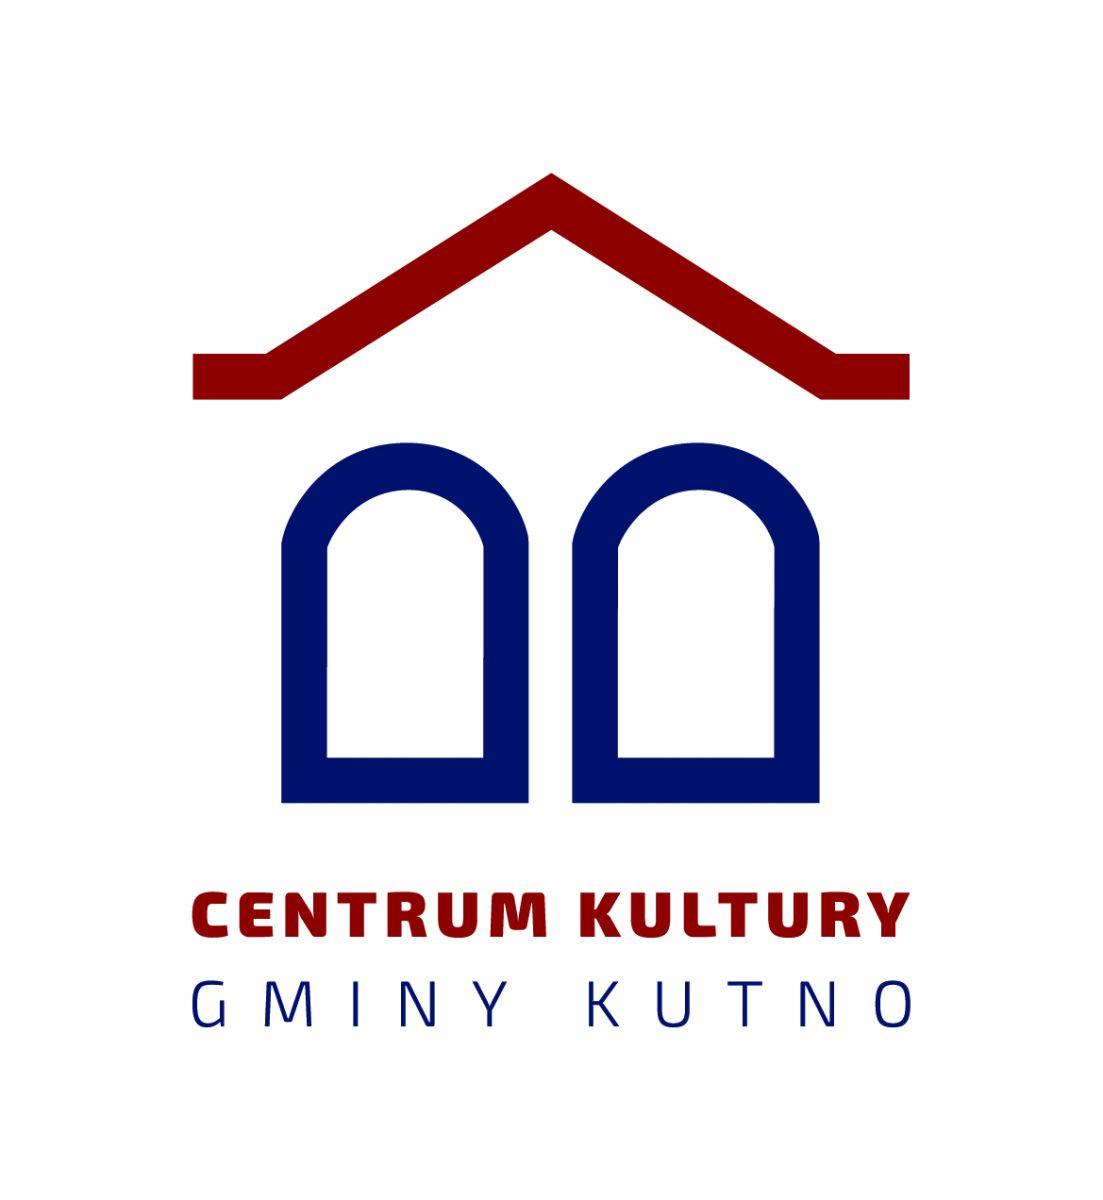 Logo Centrum Kultury Gminy Kutno